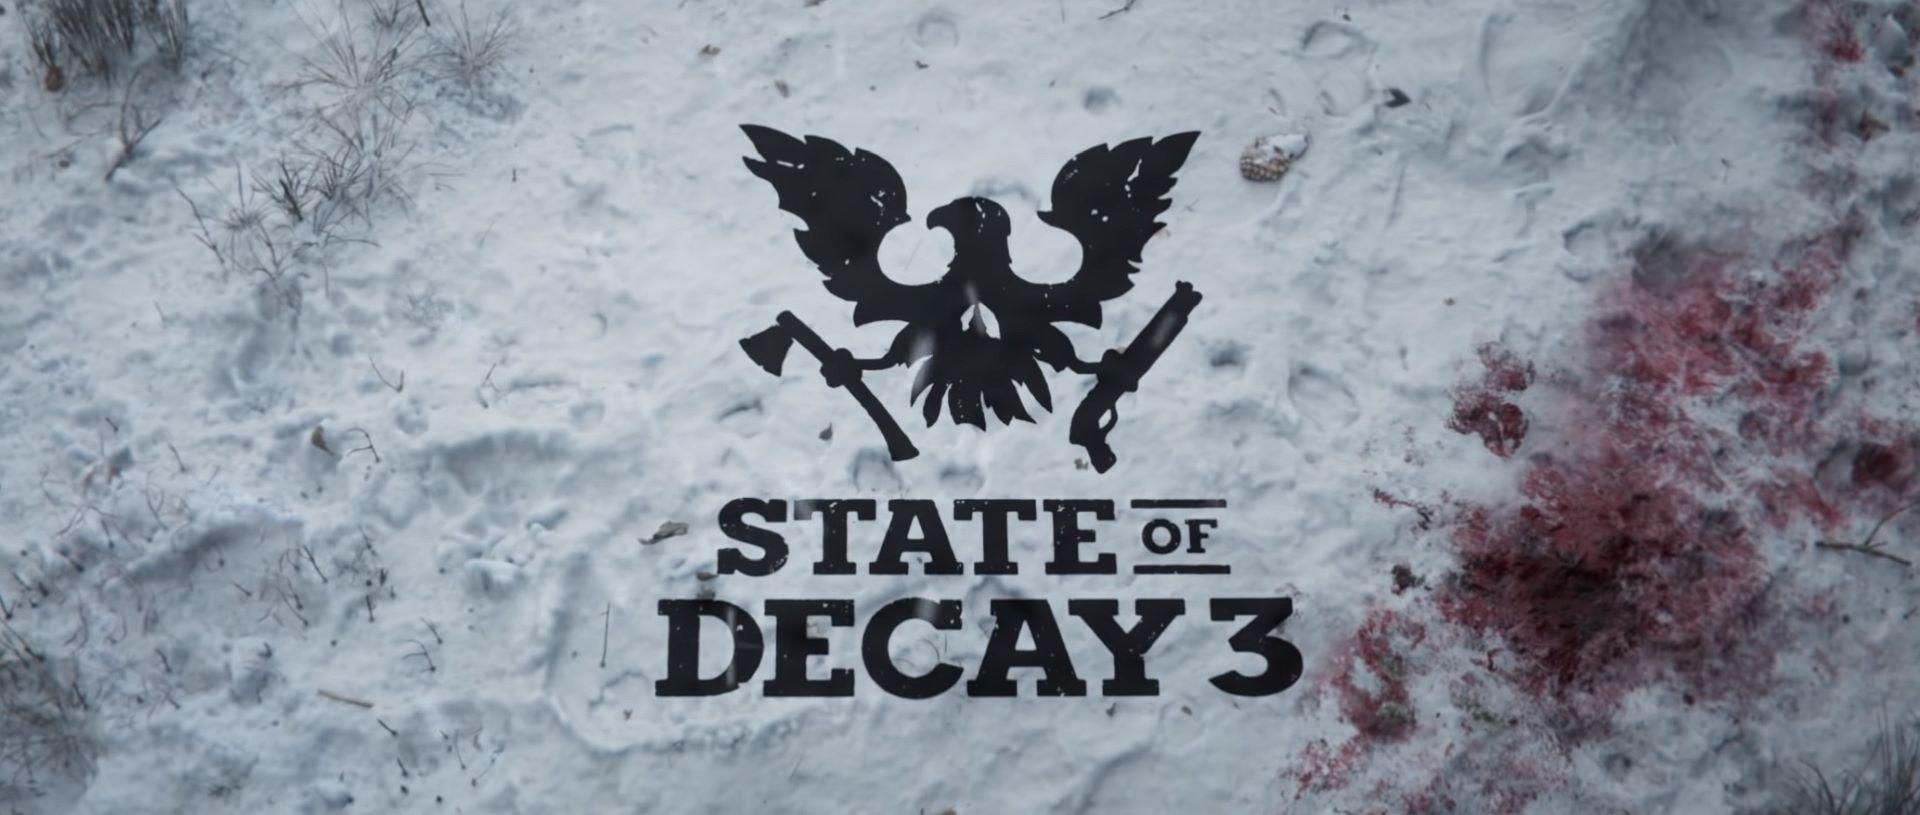 State of Decay 3 è in una fase iniziale di pre-produzione